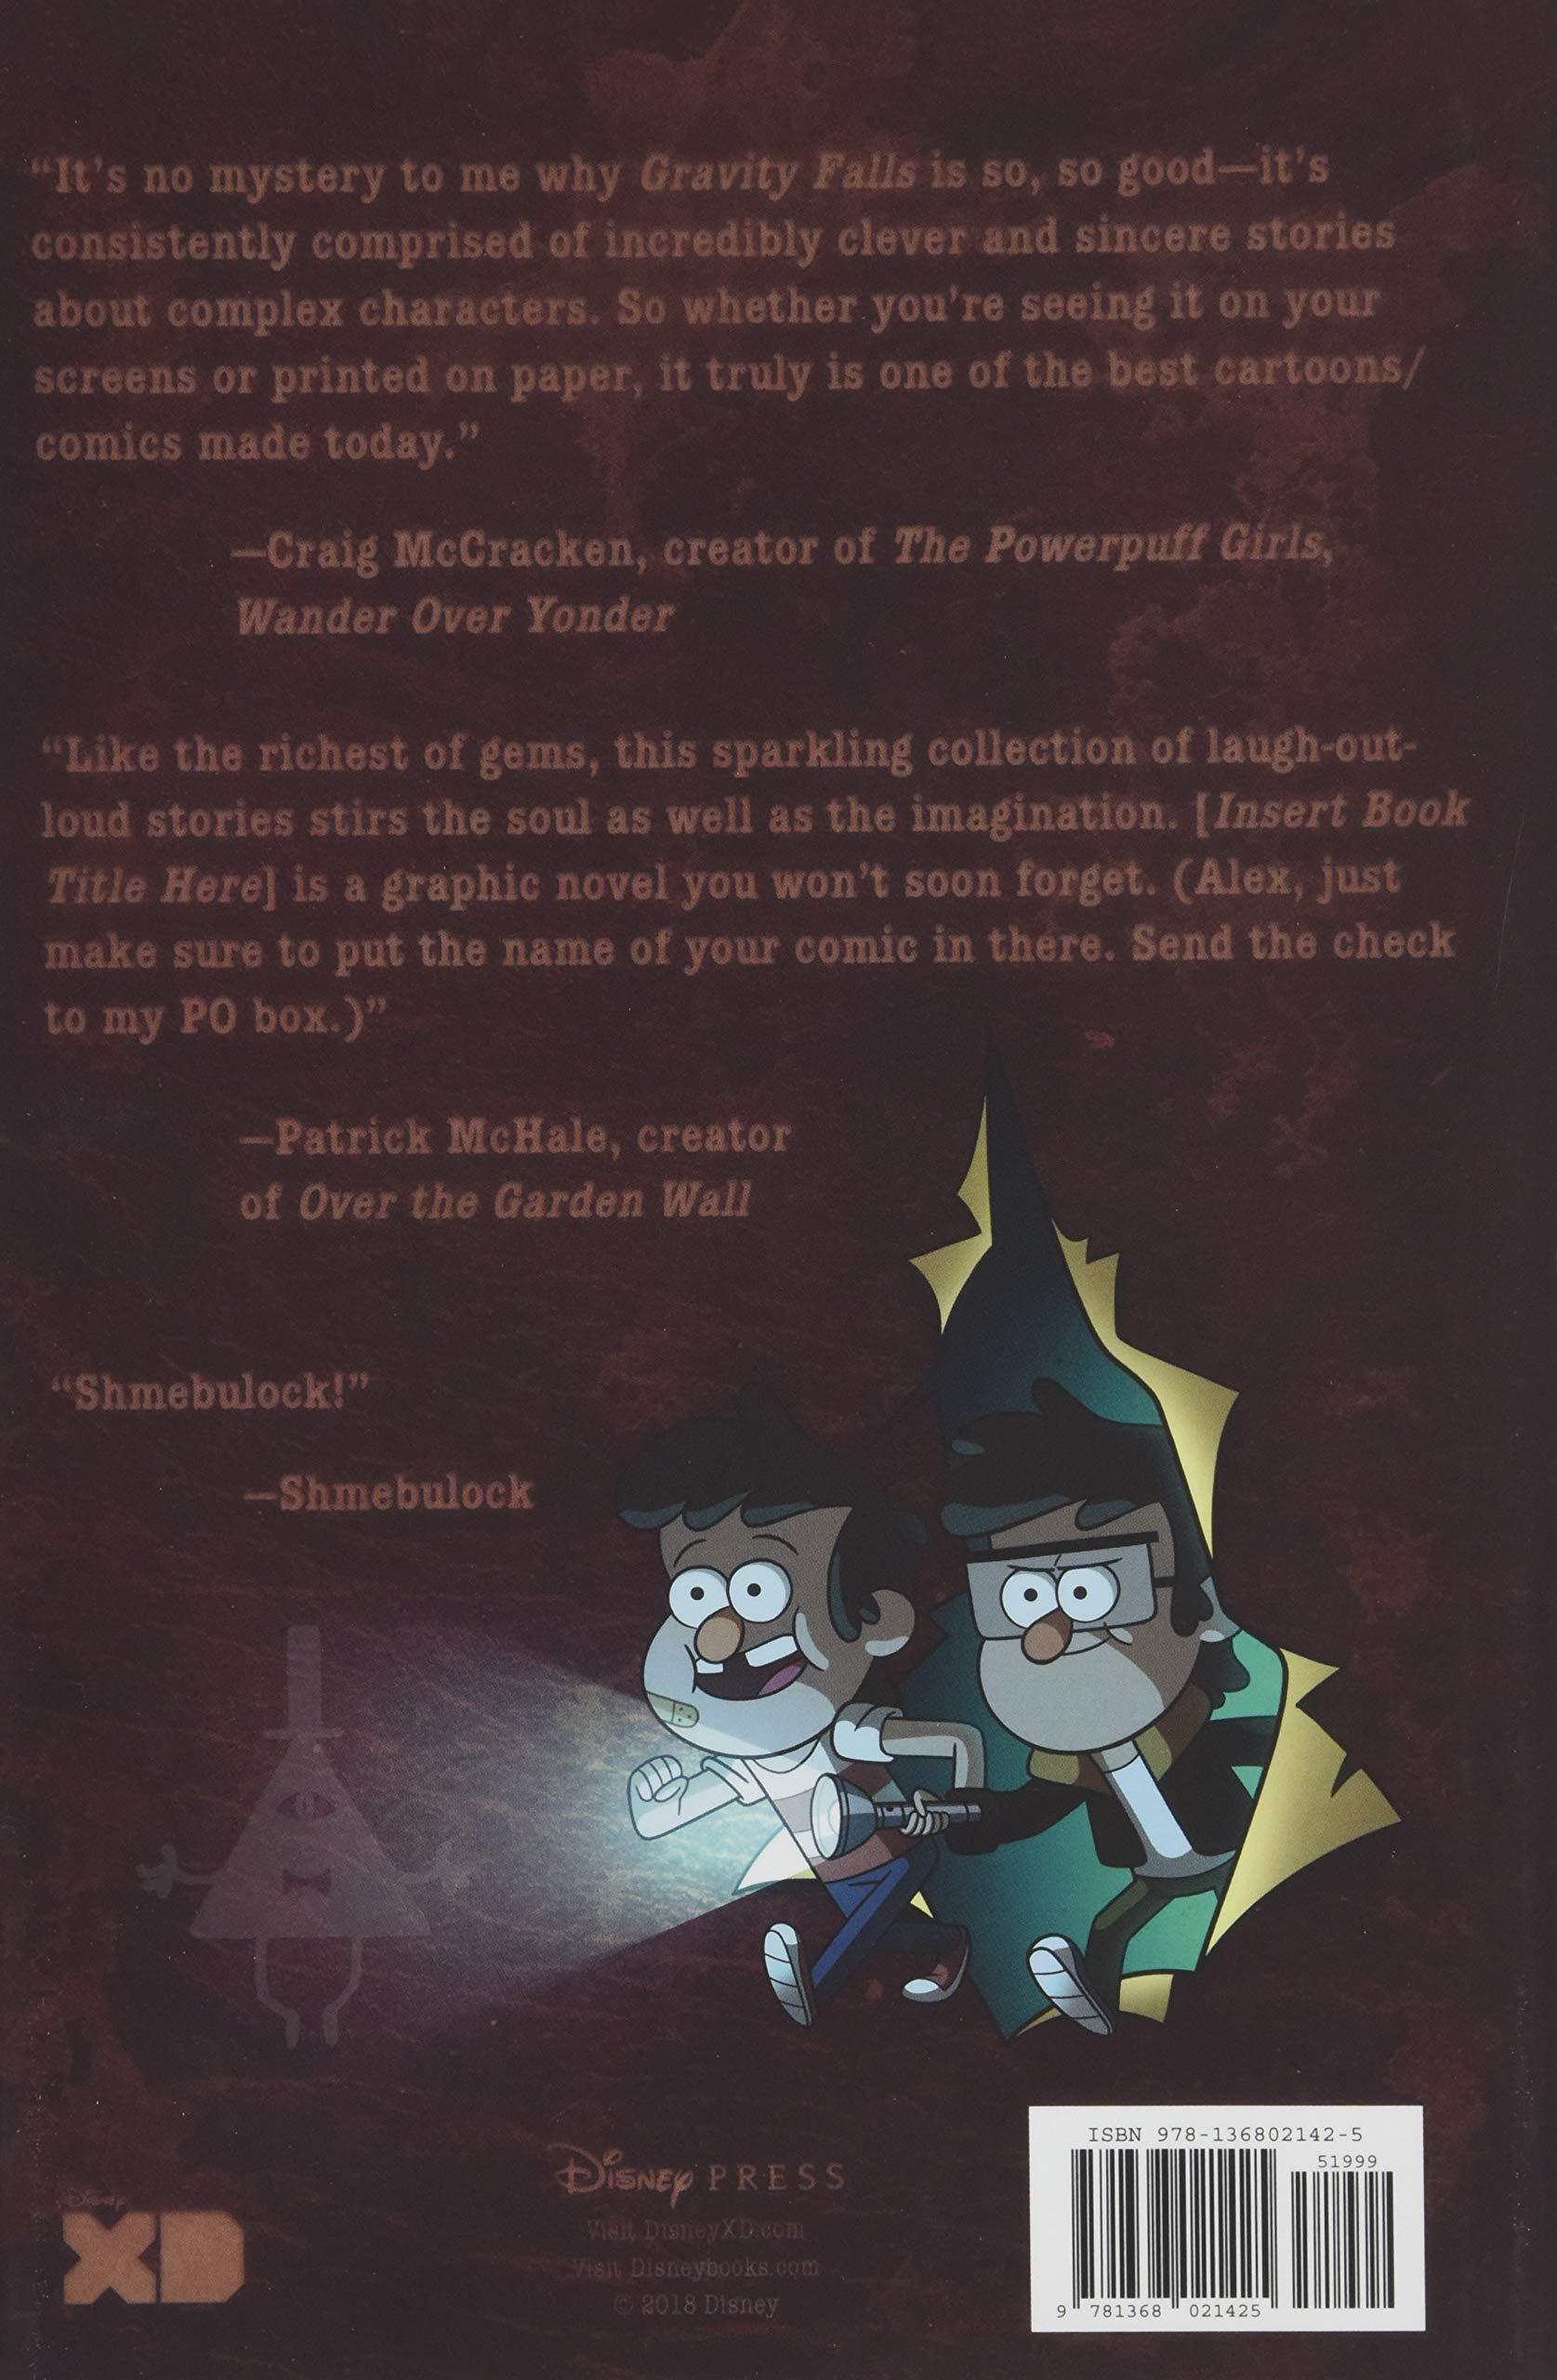 Gravity Falls: Lost Legends: 4 All-New Adventures!: Alex